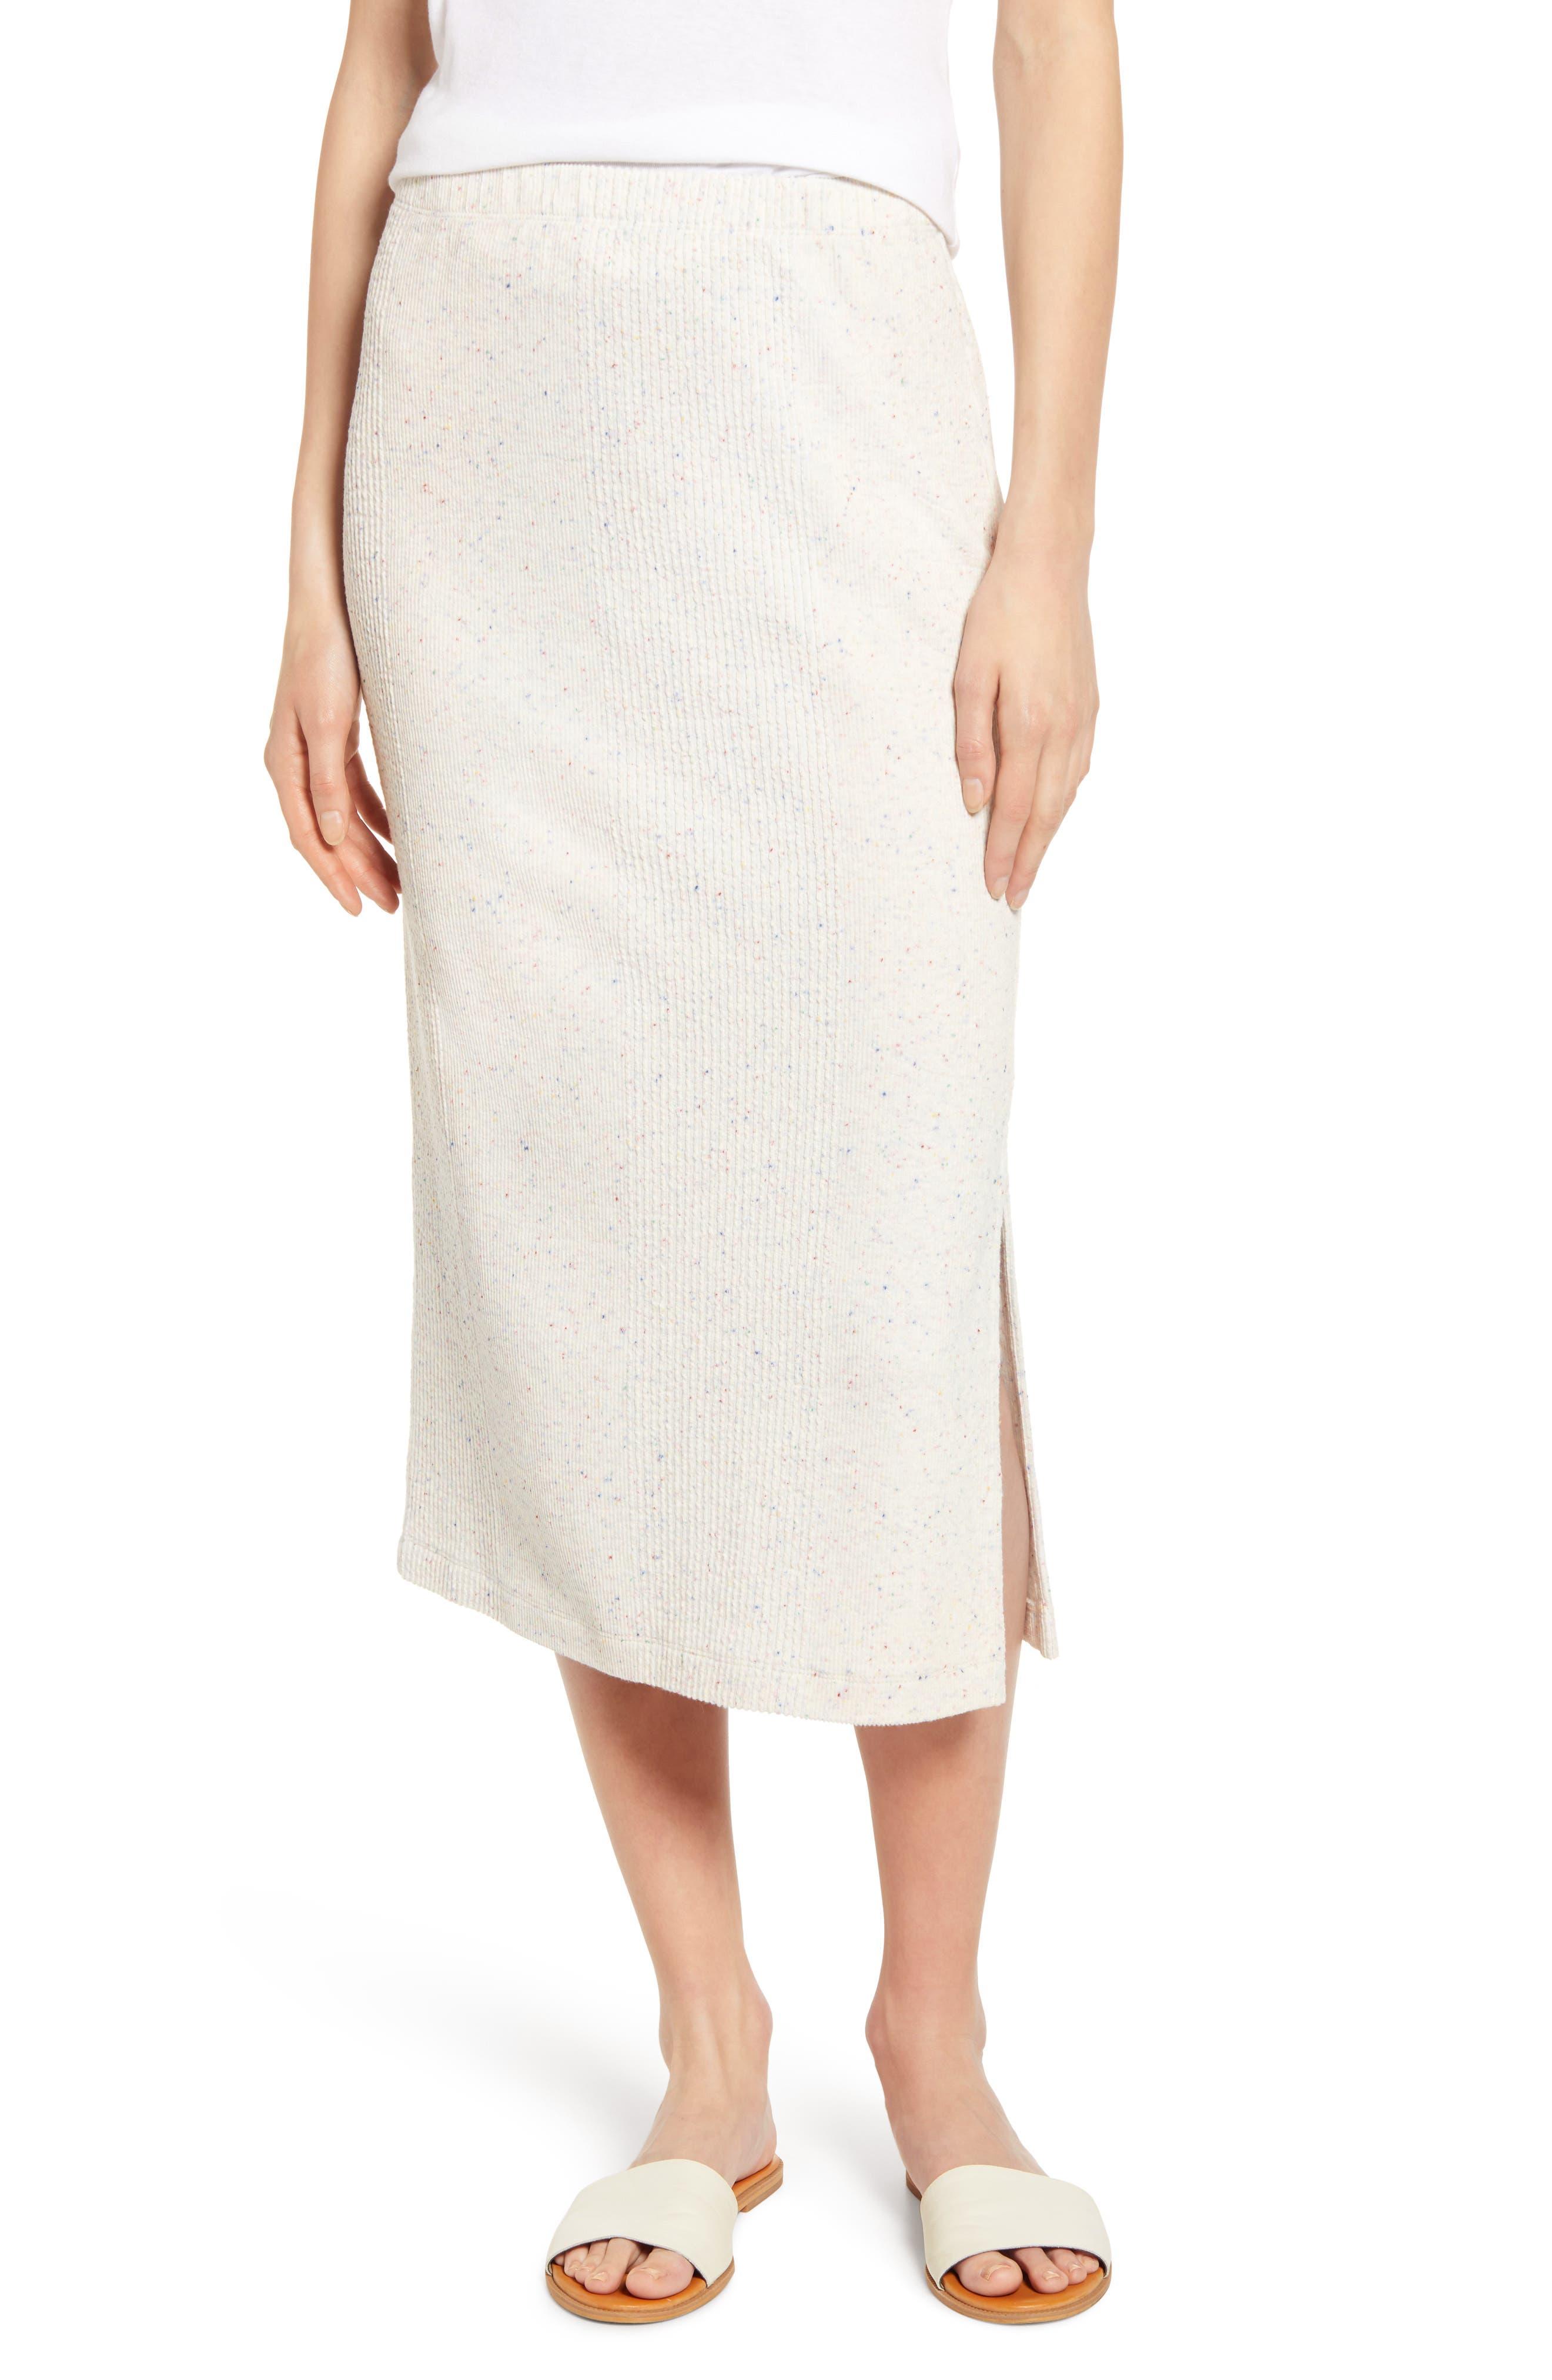 Lou & Grey Speckled Midi Skirt, Beige